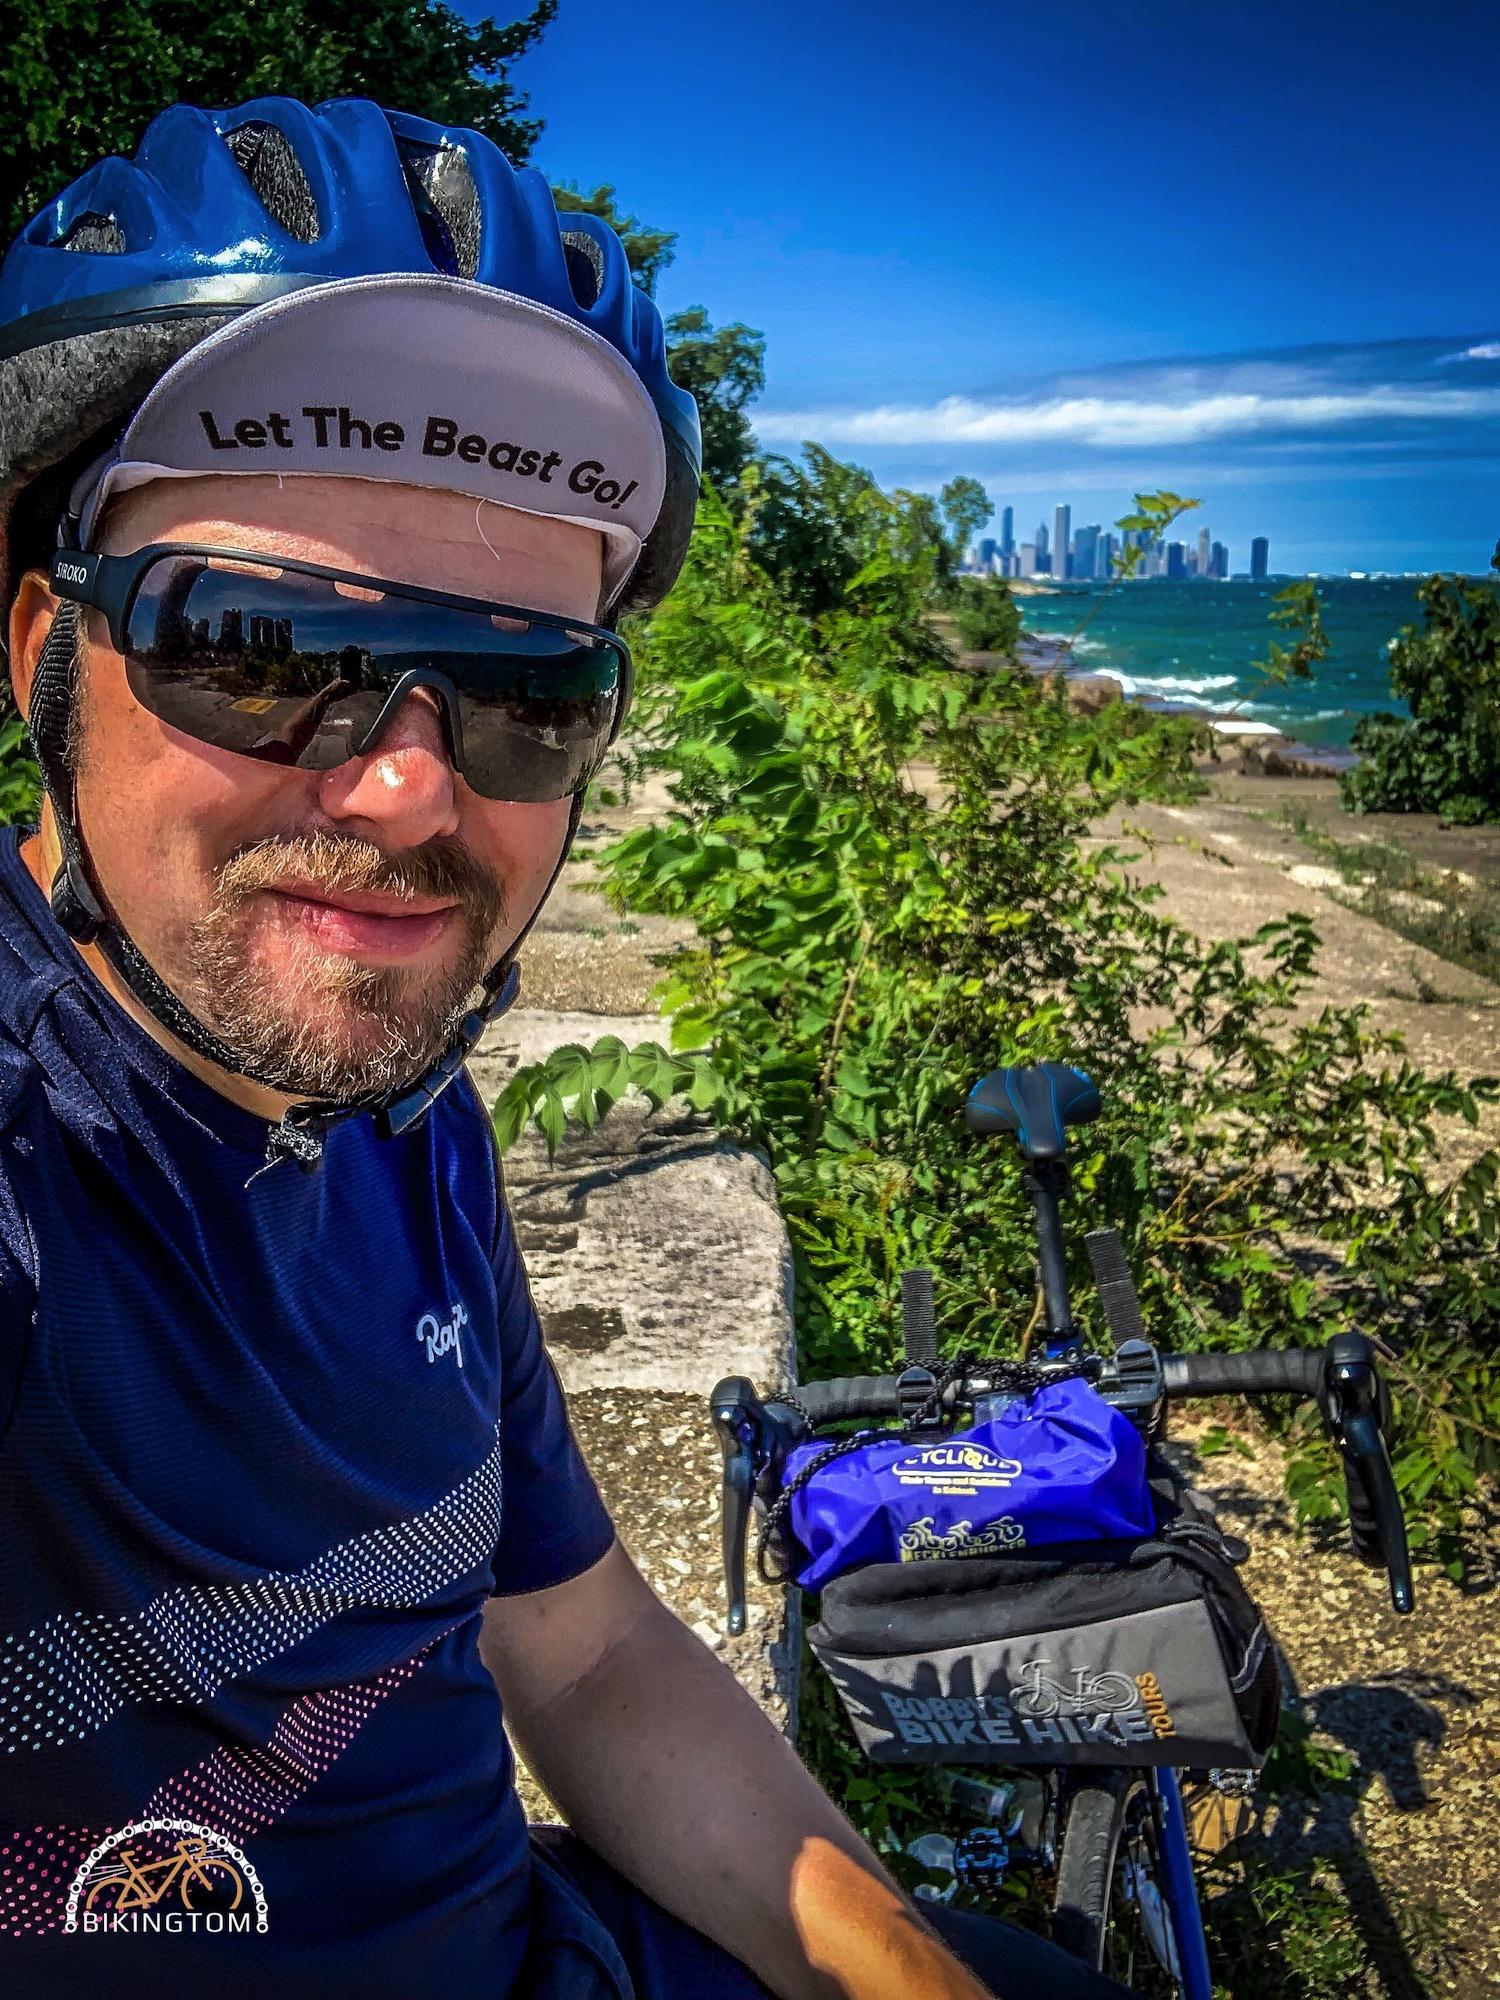 Cycling,Chicago,Fahrrad,Bike,bikingtom,Lake Michigan,Cyclique,666Gravel